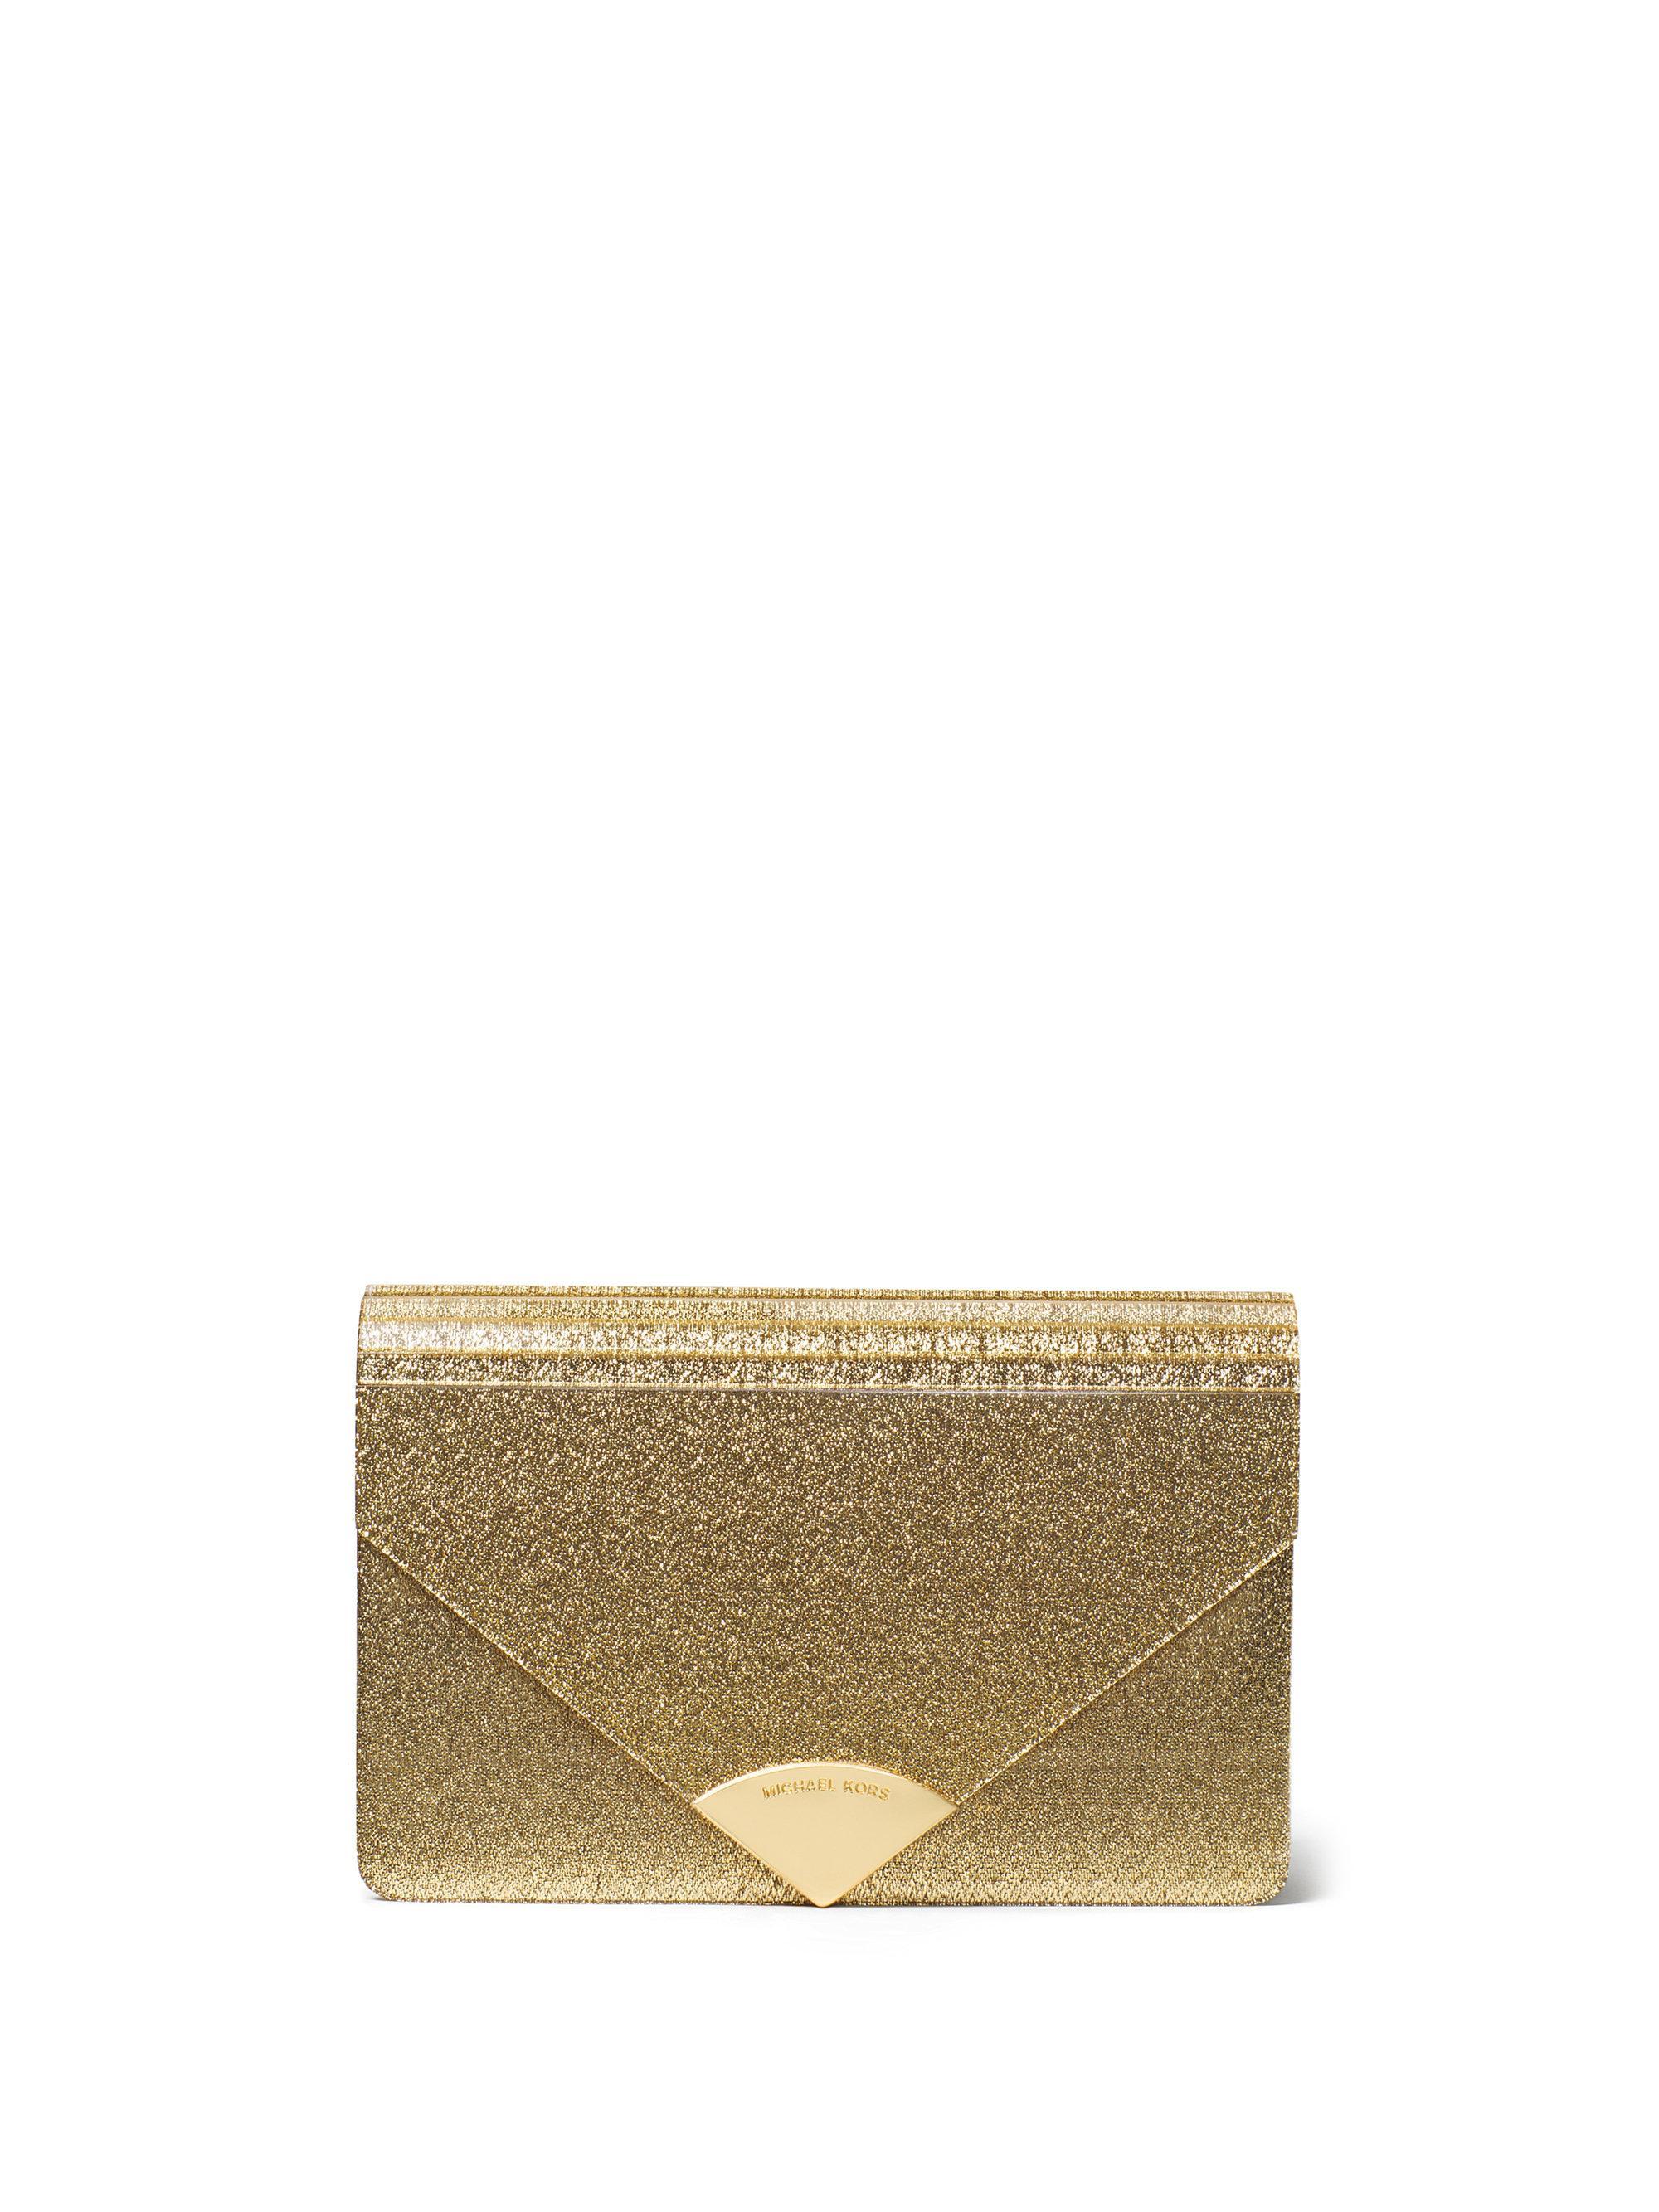 f5597a32a885 Lyst - Michael Kors Barbara Medium Envelope Clutch in Metallic